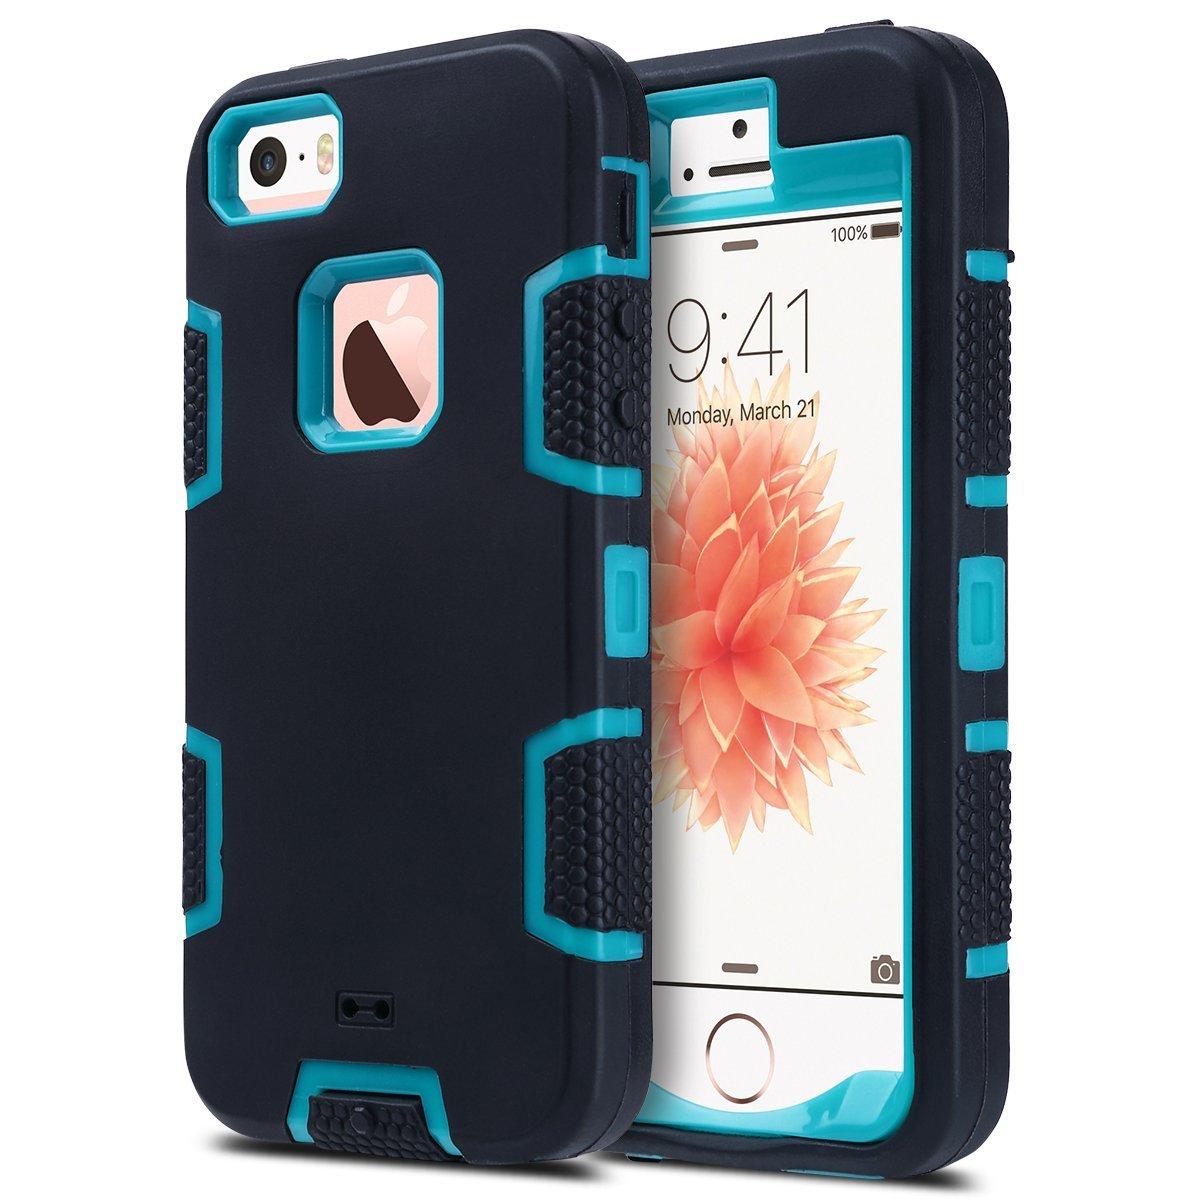 Iphone 5 full cover